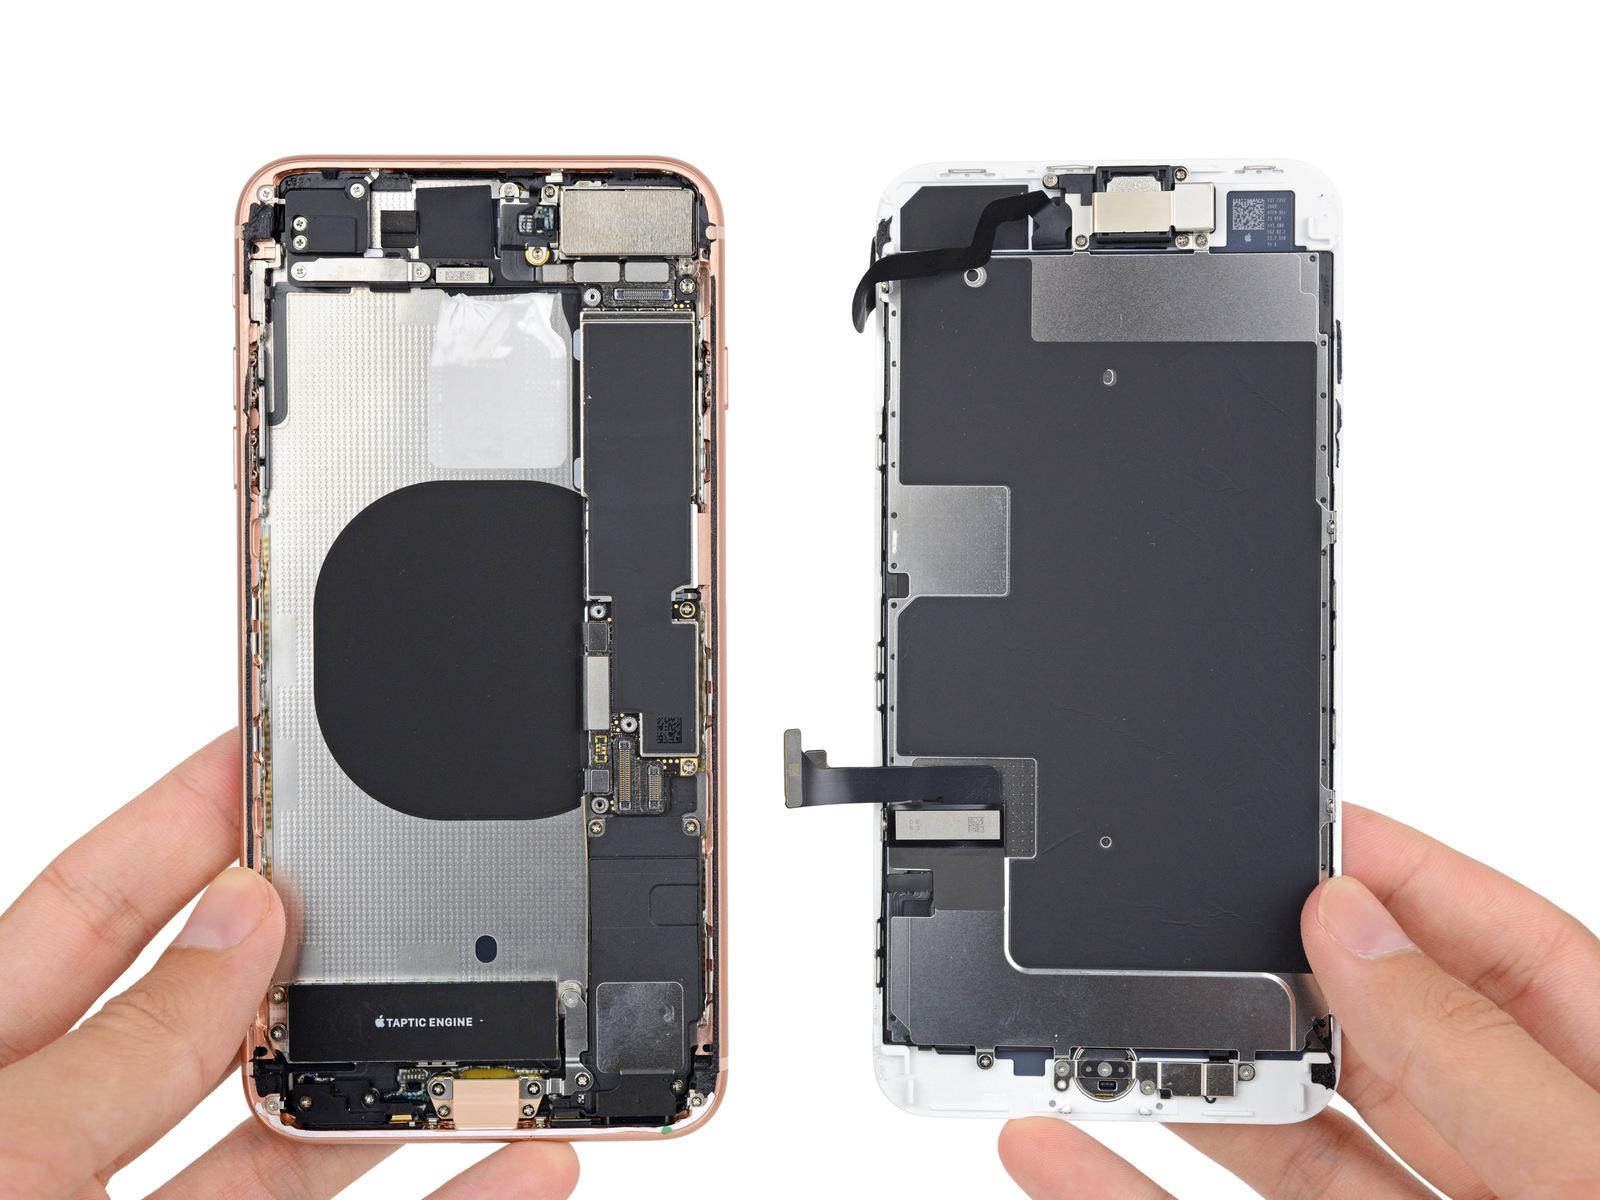 iPhone8Plus拆解 内部到底是什么样的